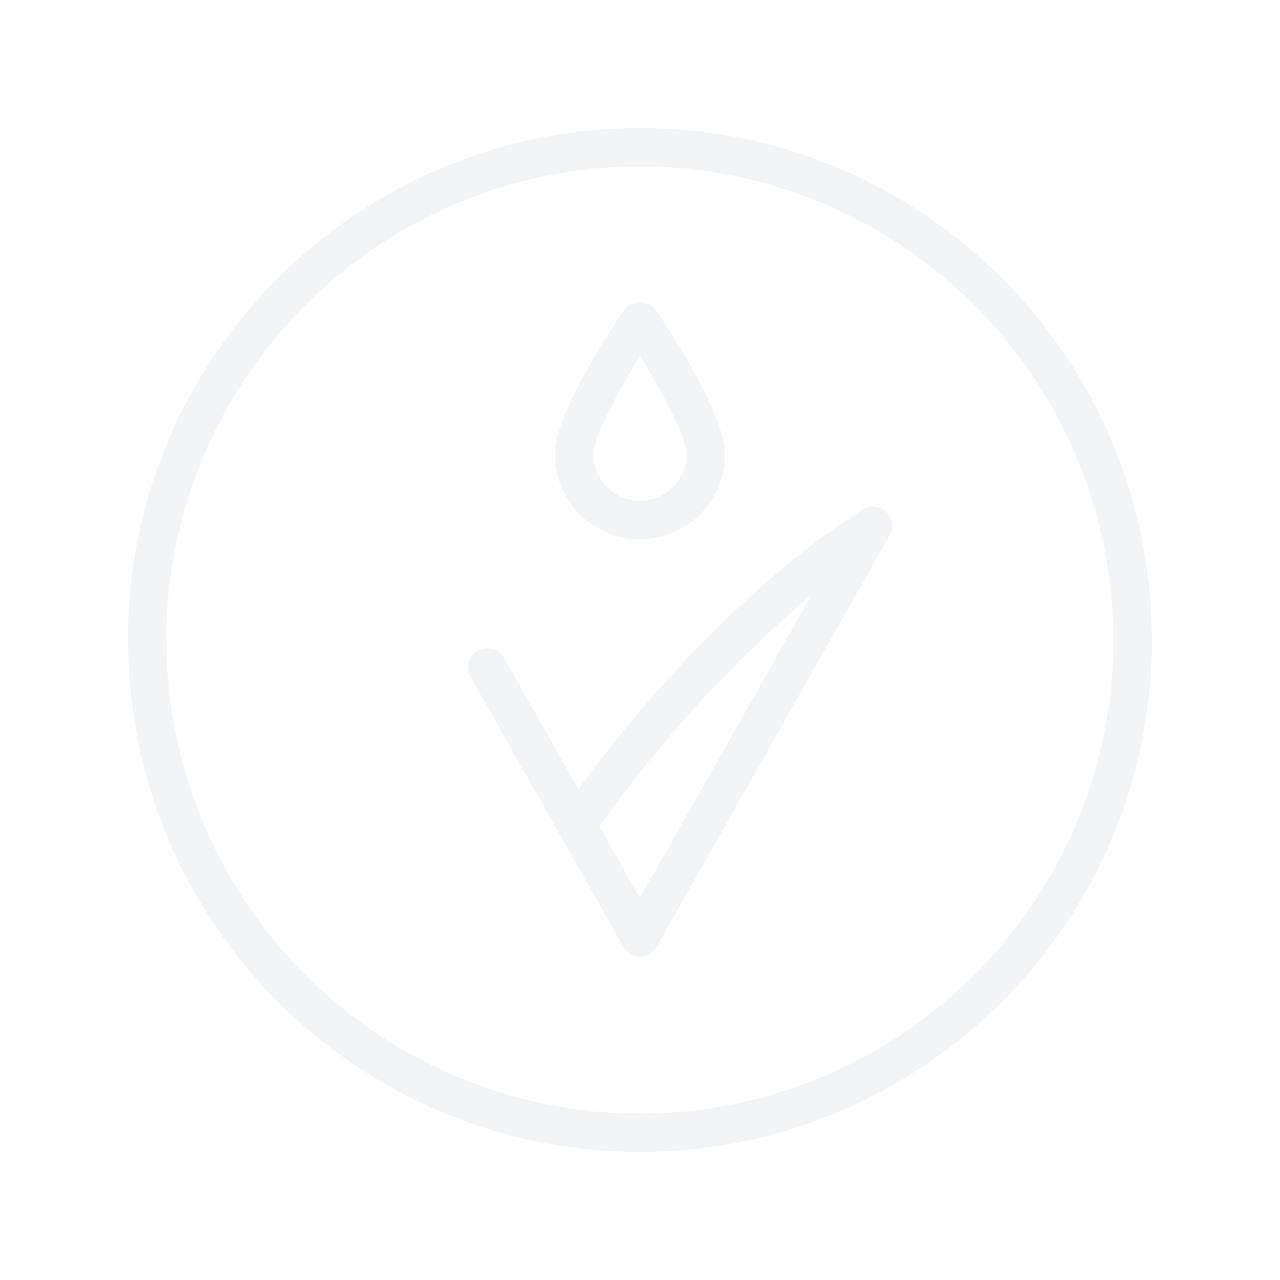 Clarins Daily Energizer Cream